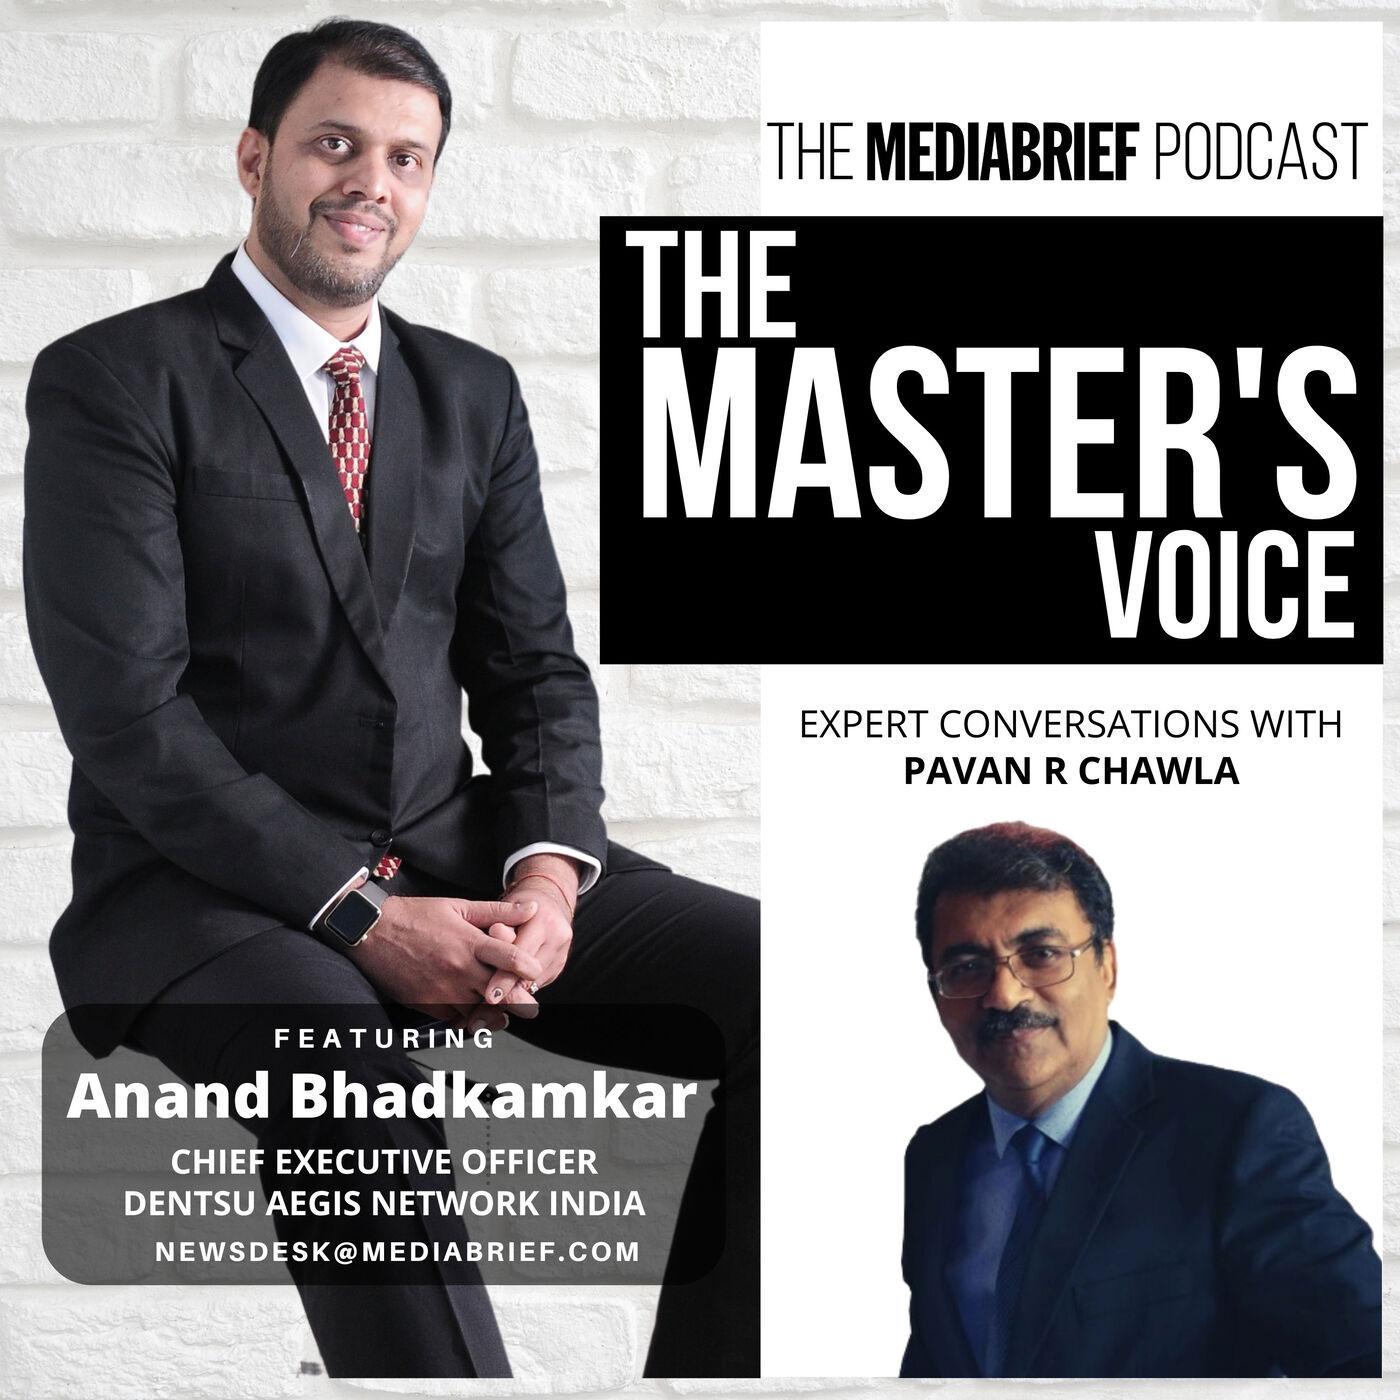 ANAND BHADKAMKAR - CEO - DAN INDIA ON THE MASTER'S VOICE